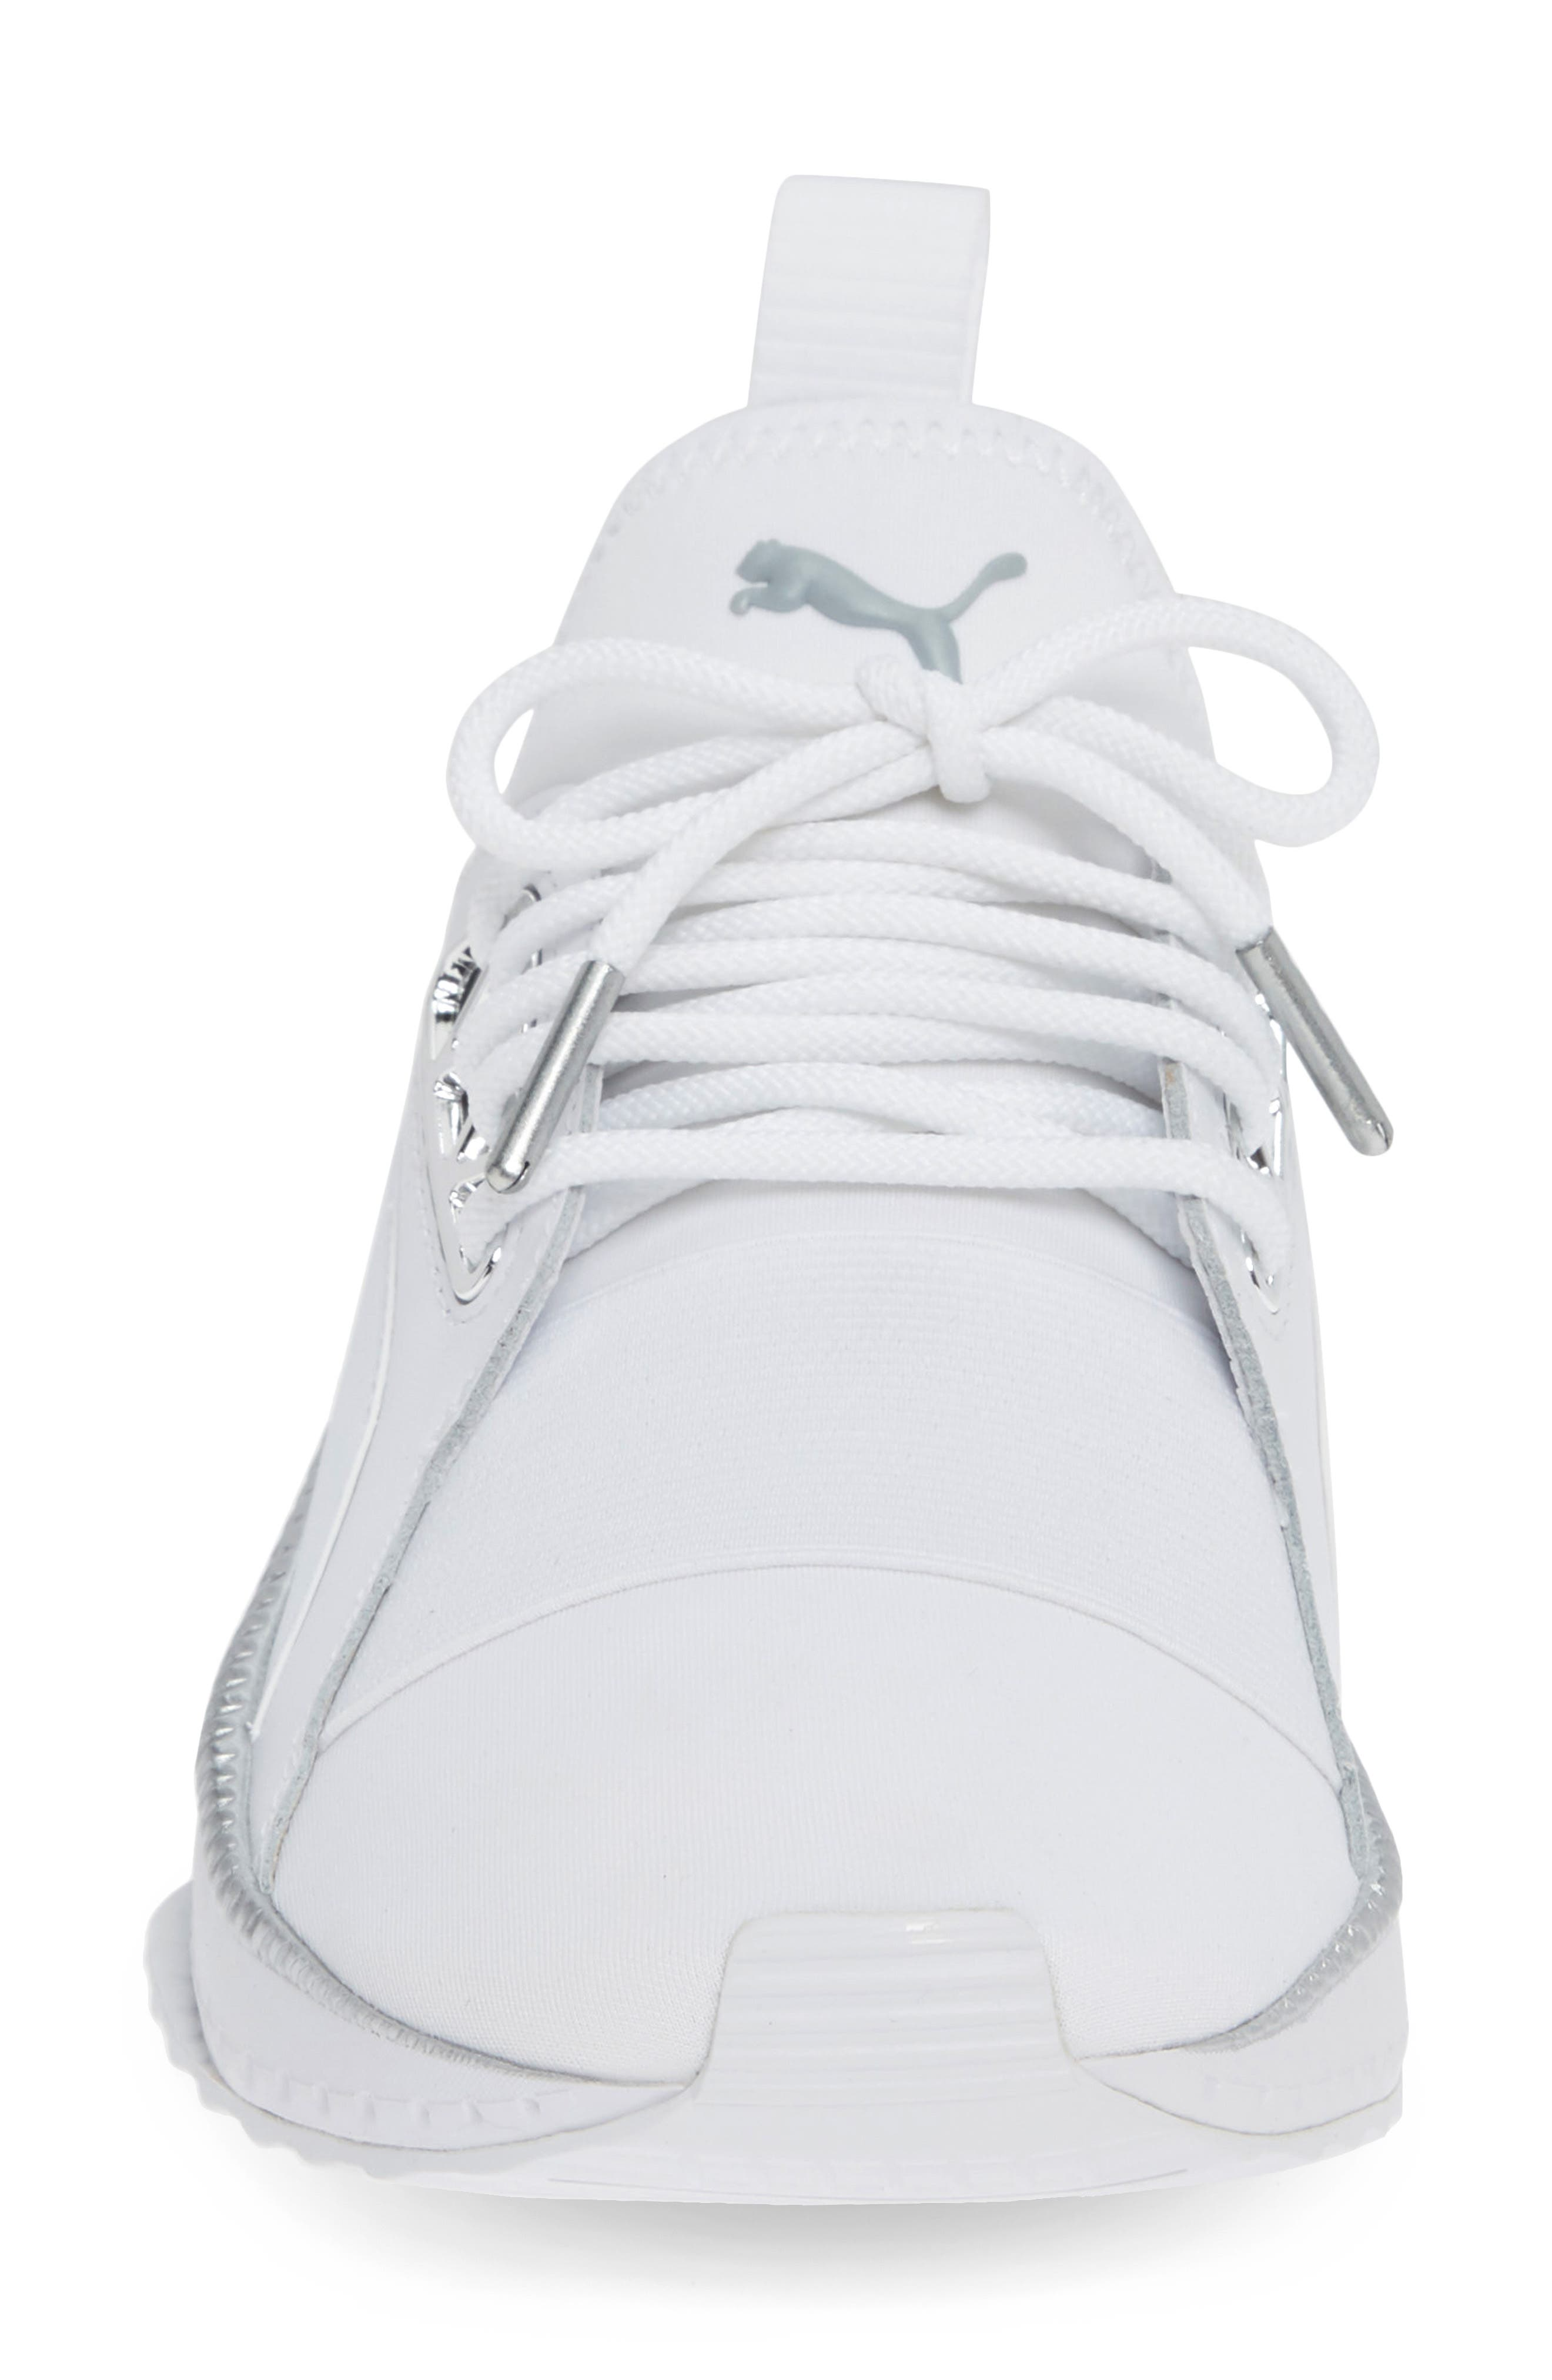 TSUGI Apex Jewel Sneaker,                             Alternate thumbnail 4, color,                             PUMA WHITE/ PUMA WHITE